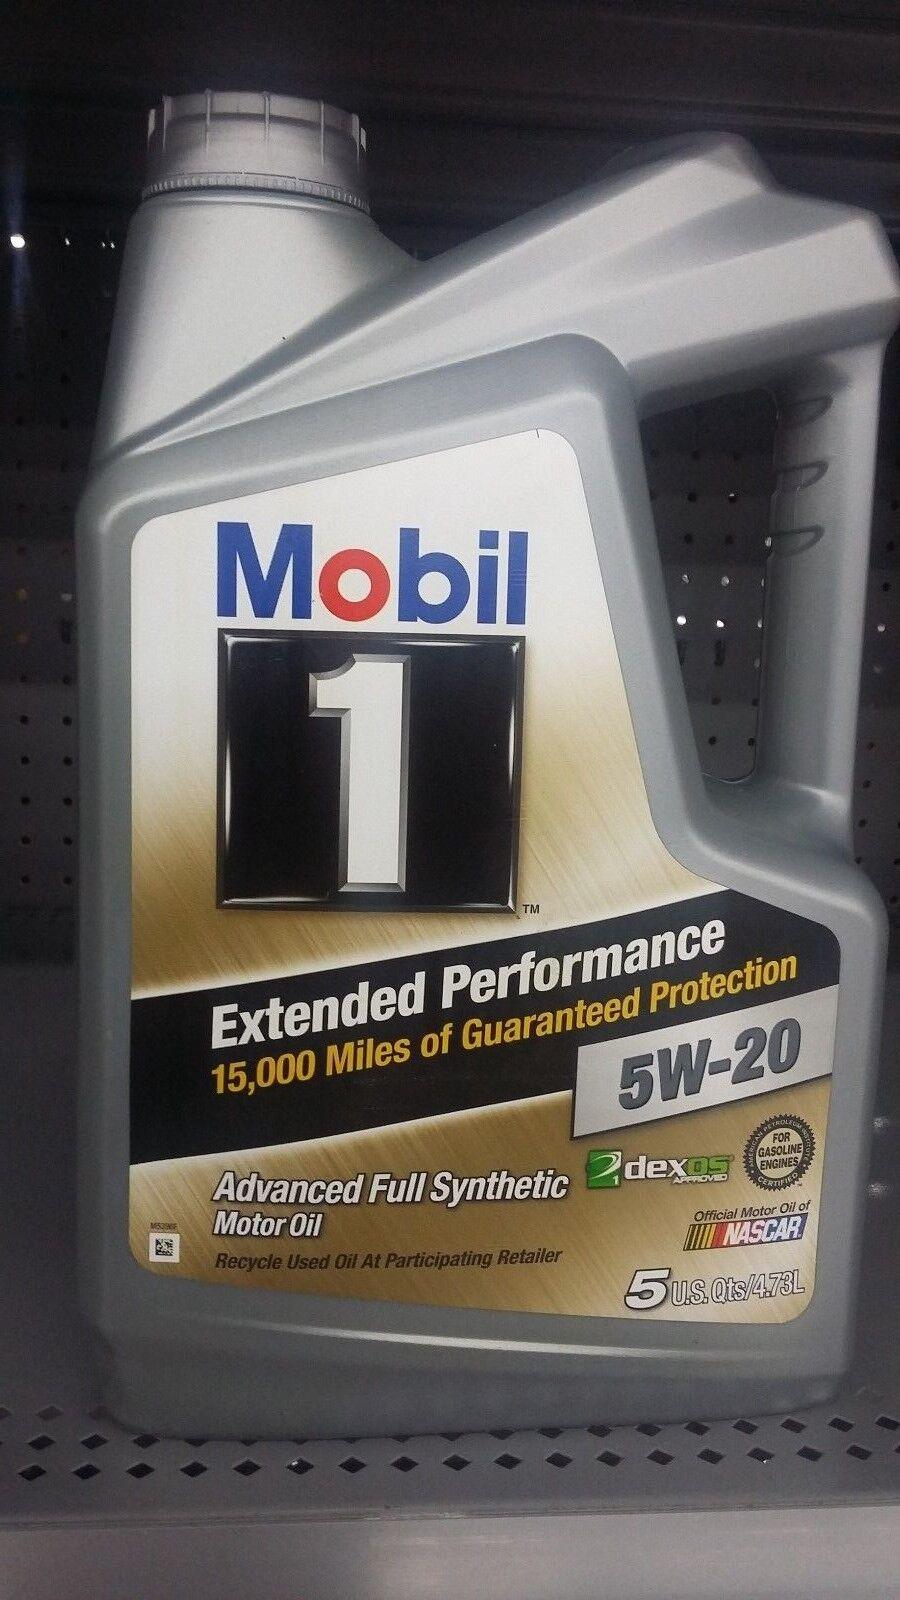 Mobil 1 extended performance 5w 20 motor oil 5 quarts for Sales on motor oil